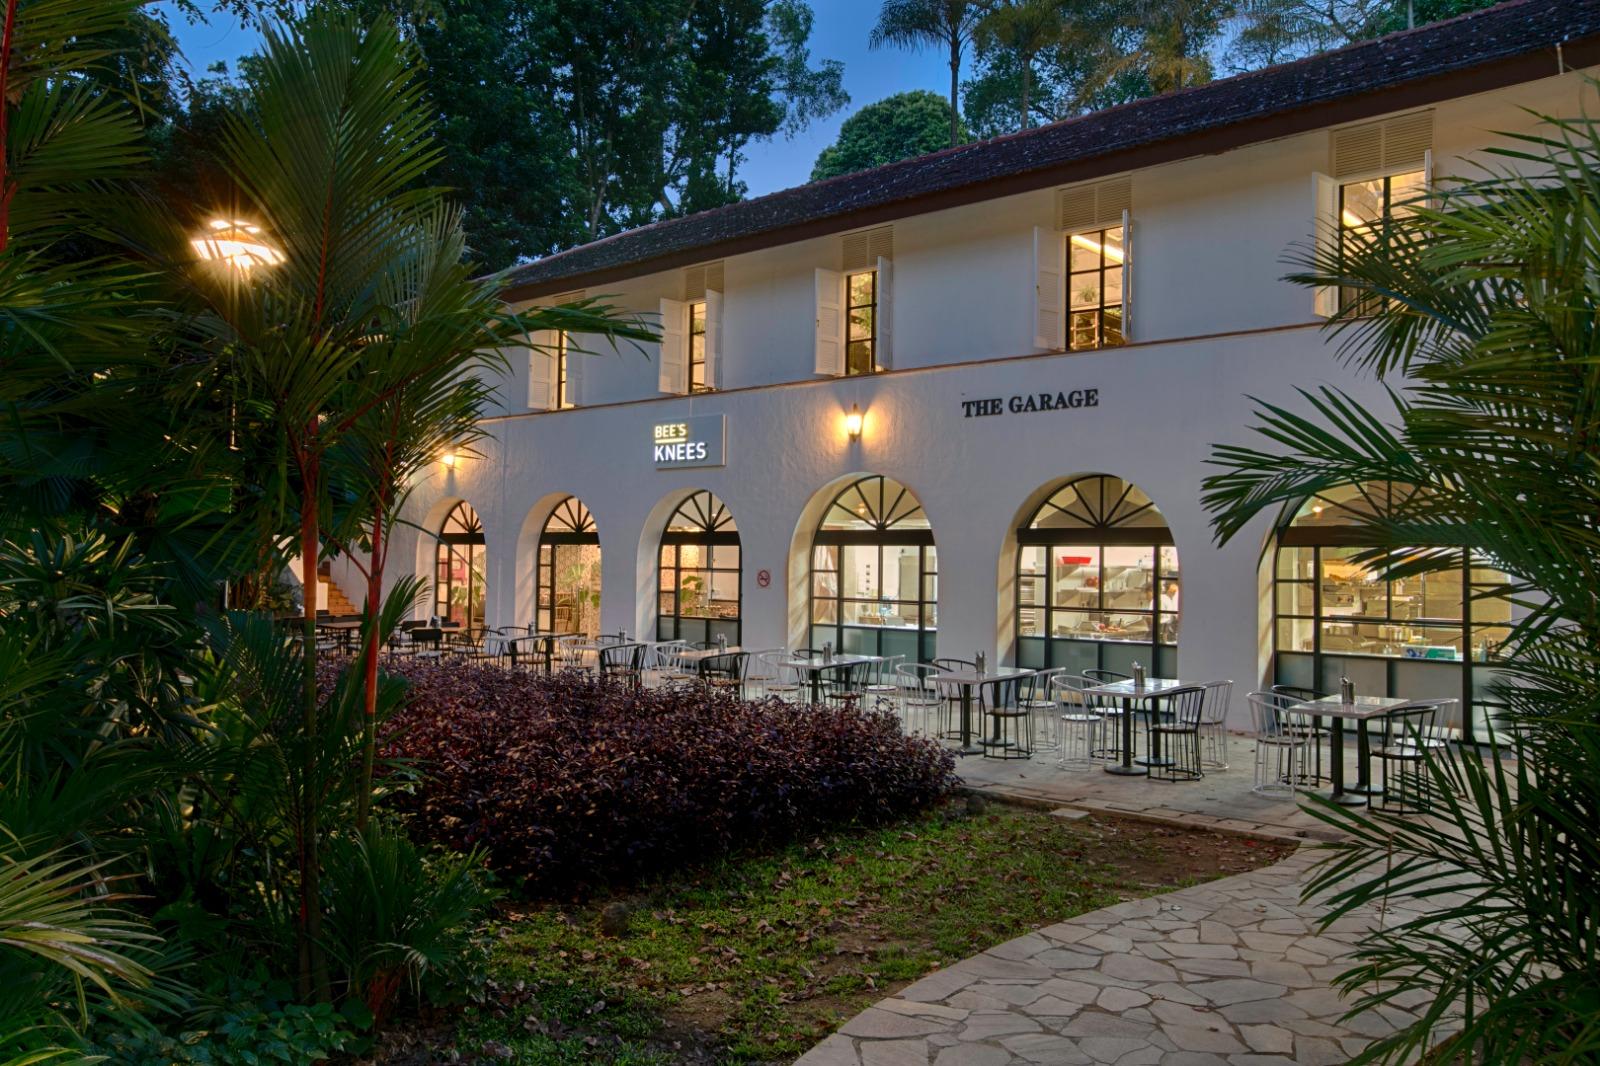 THE GARAGE - 50 Cluny Park Road, Singapore Botanic Gardens, Singapore 257488